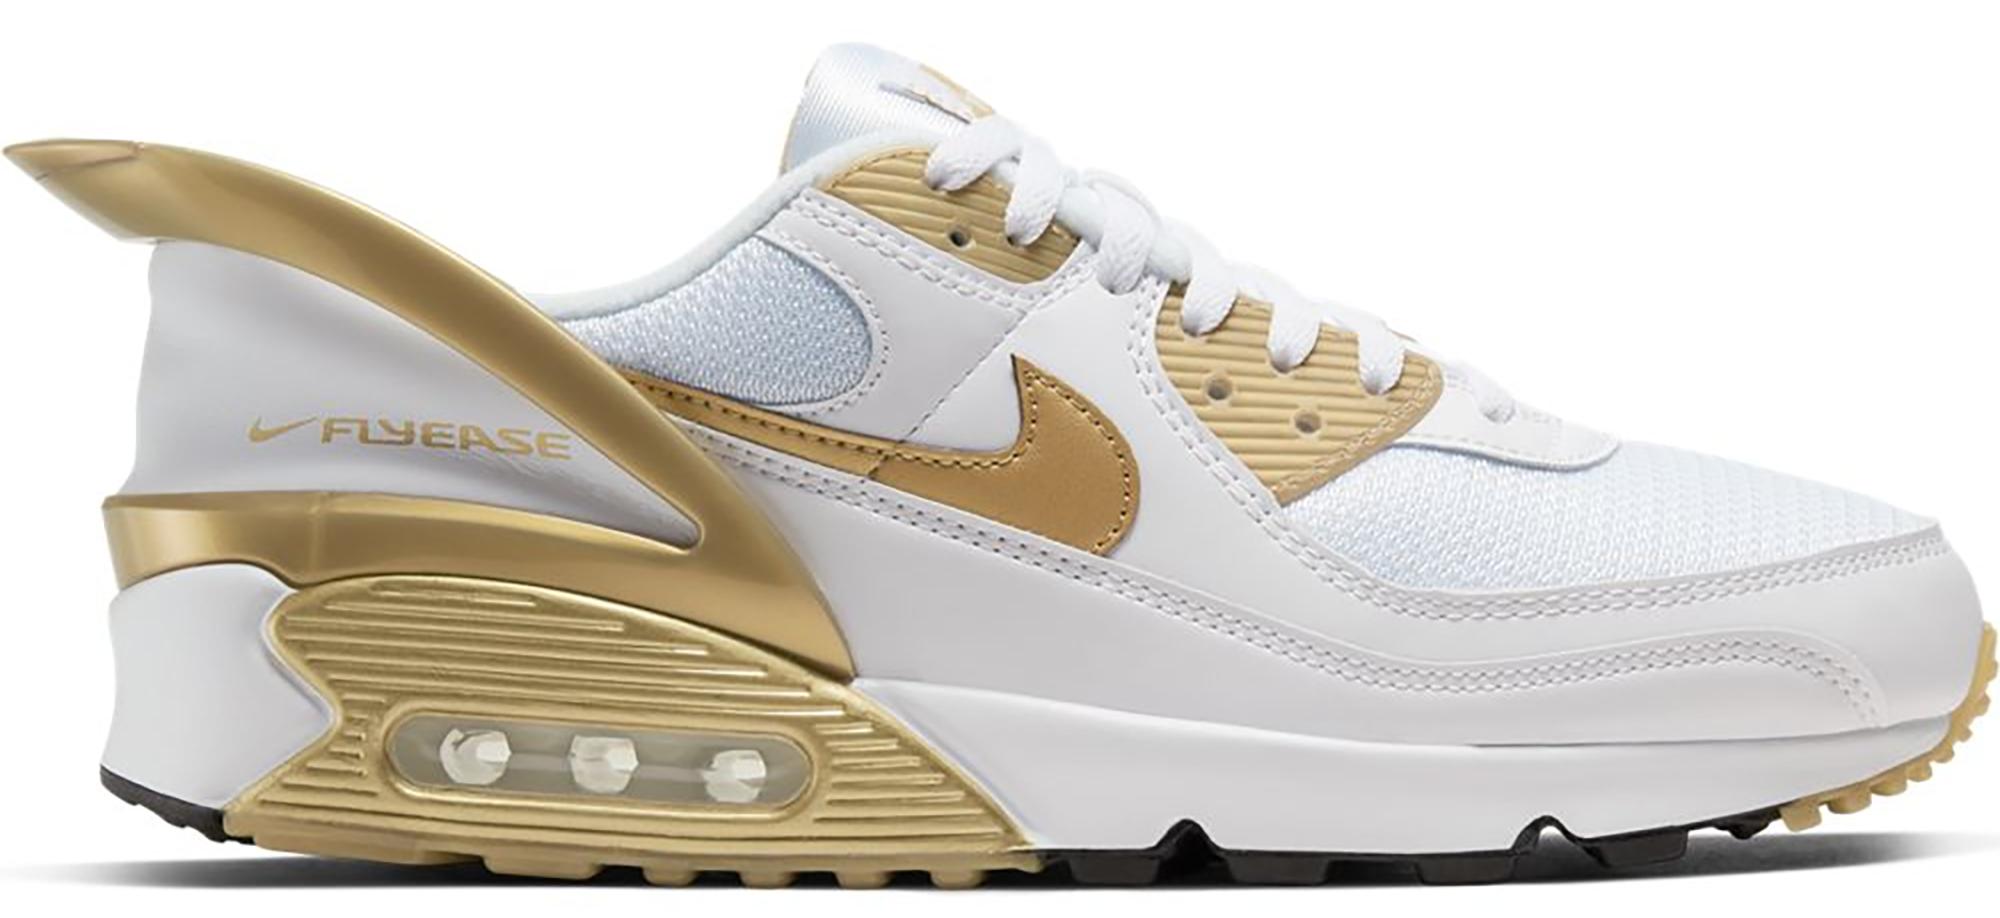 Nike Air Max 90 Flyease White Gold